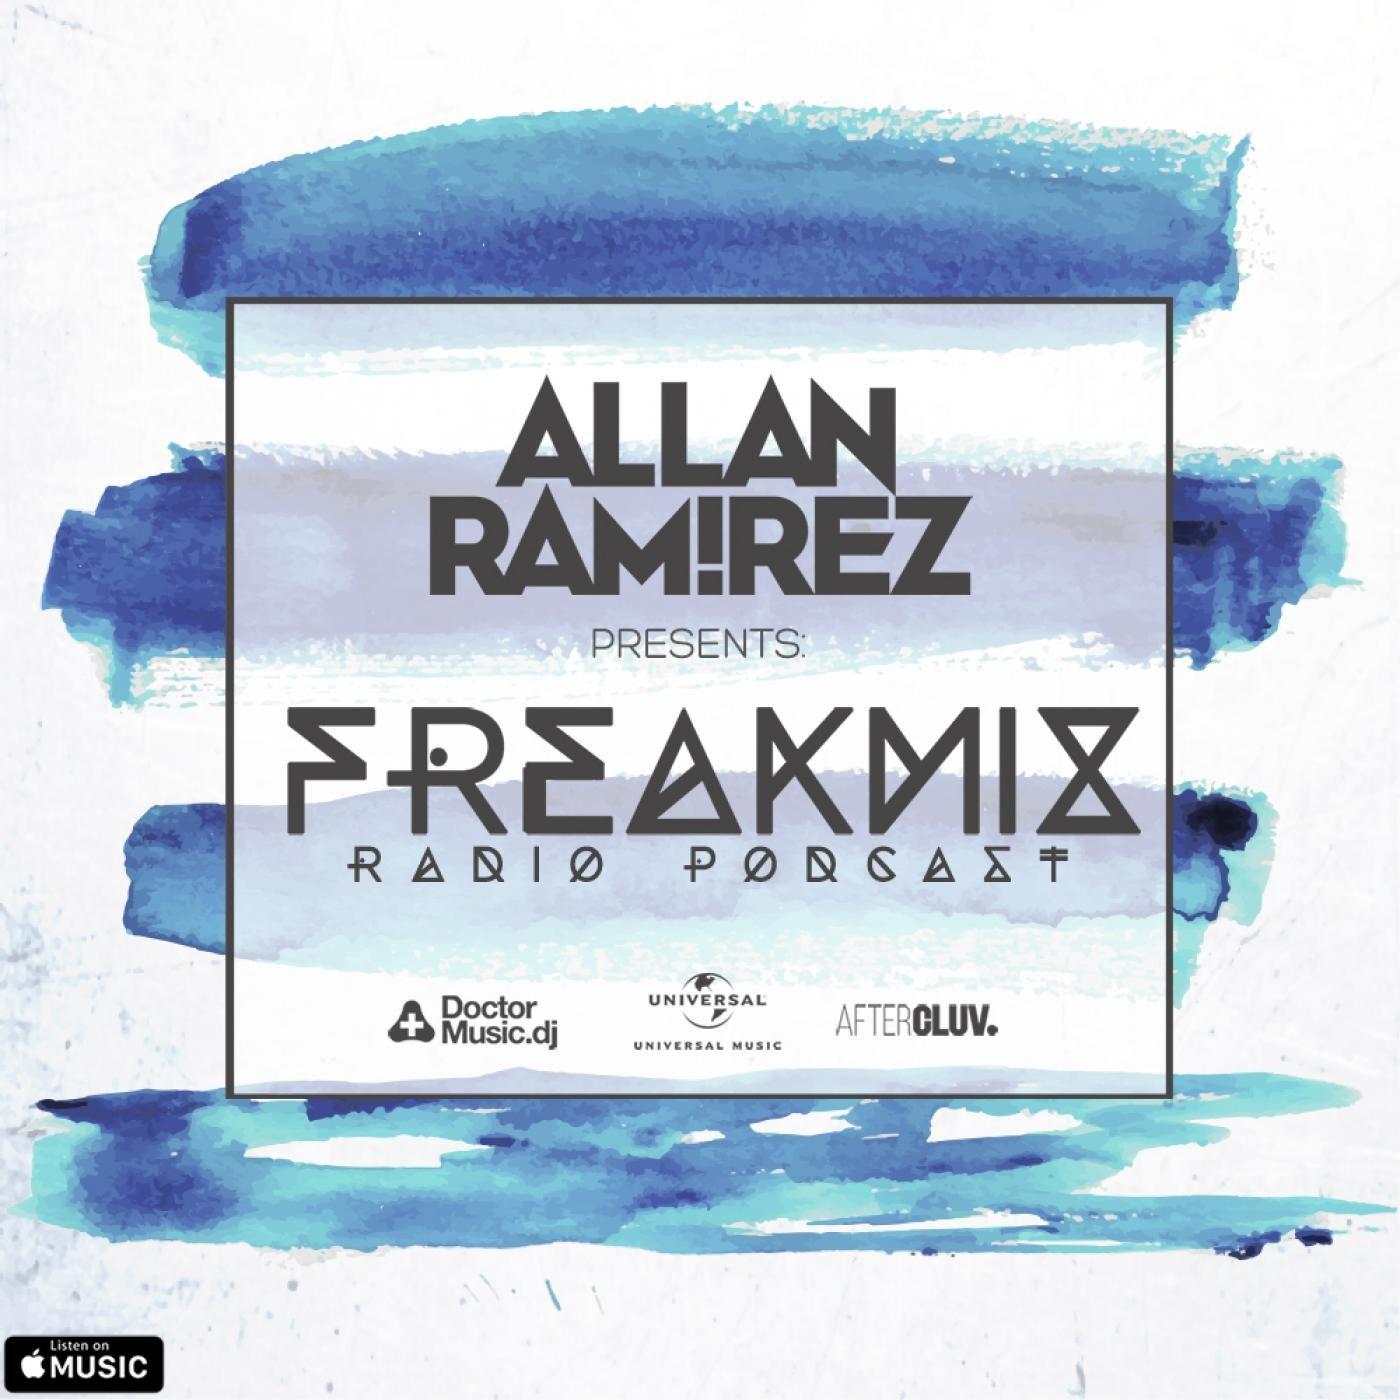 <![CDATA[Allan Ramirez FreakMix Radio]]>